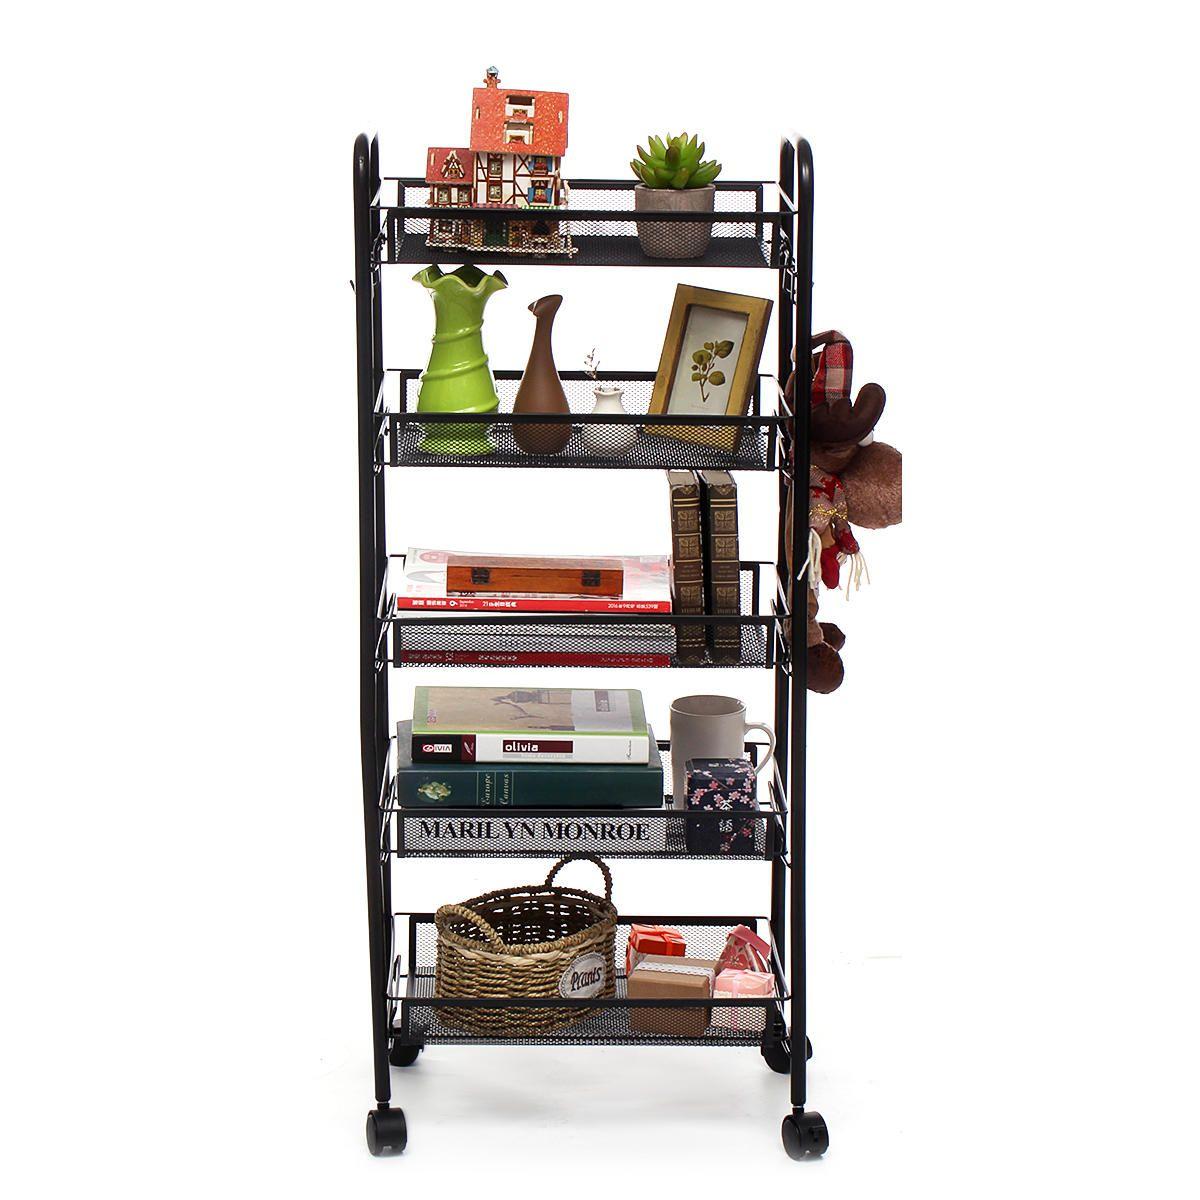 OGE US$57.11~60.11 4/5-Tier Basket Stand Kitchen Bathroom Trolley Full-Metal Rolling Food Storage Cart with Lockable Wheels 4 Side Hooks